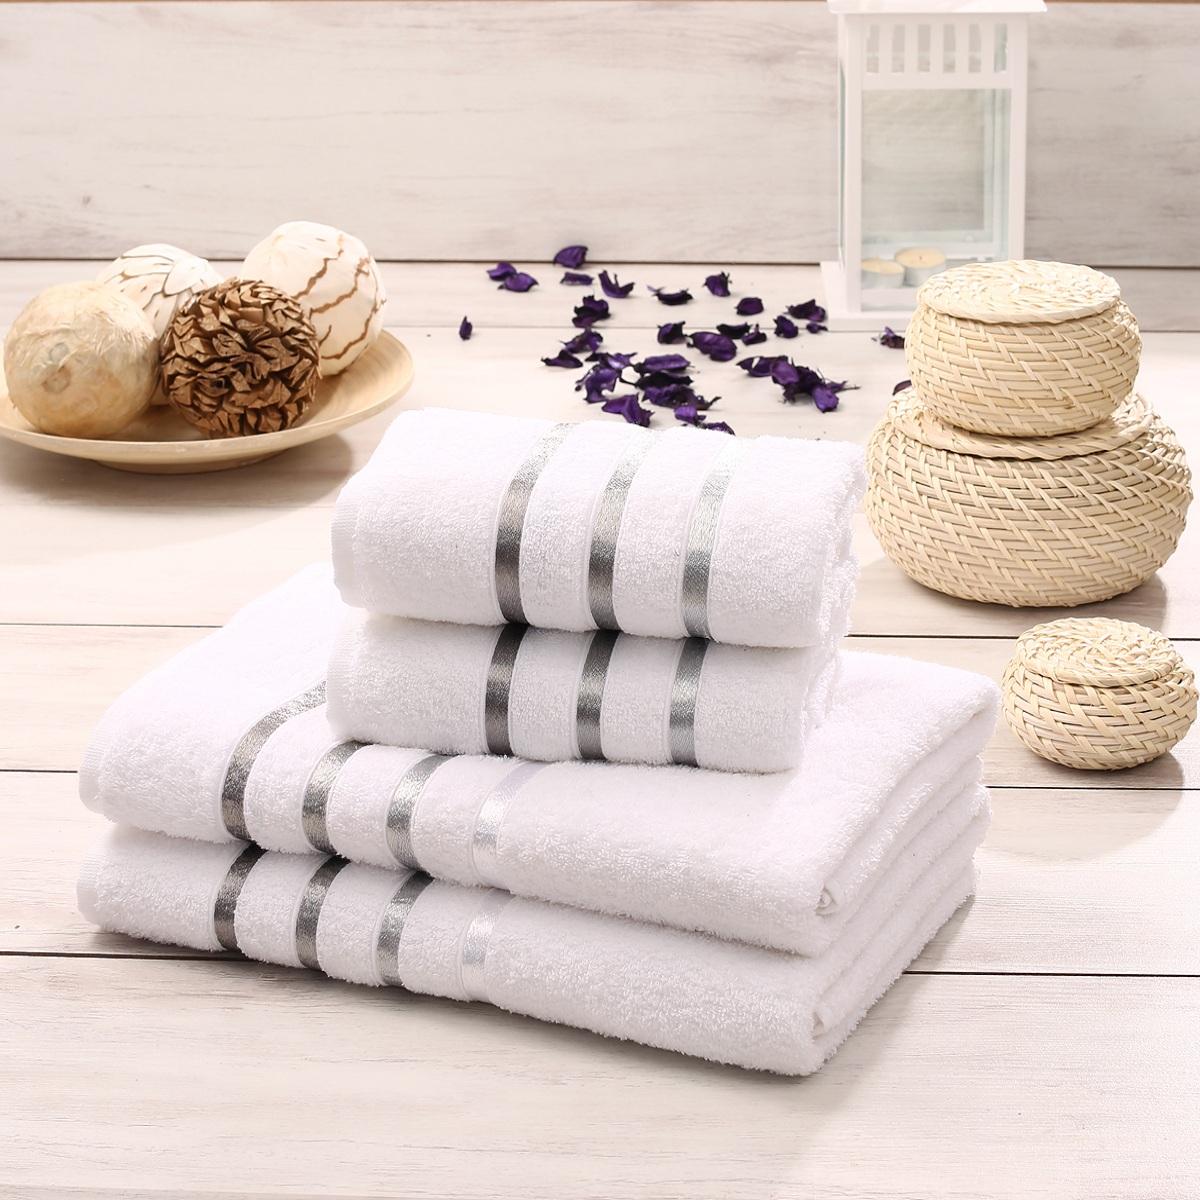 Купить Полотенца Karna, Полотенце Bale Цвет: Белый (Набор), Турция, Махра